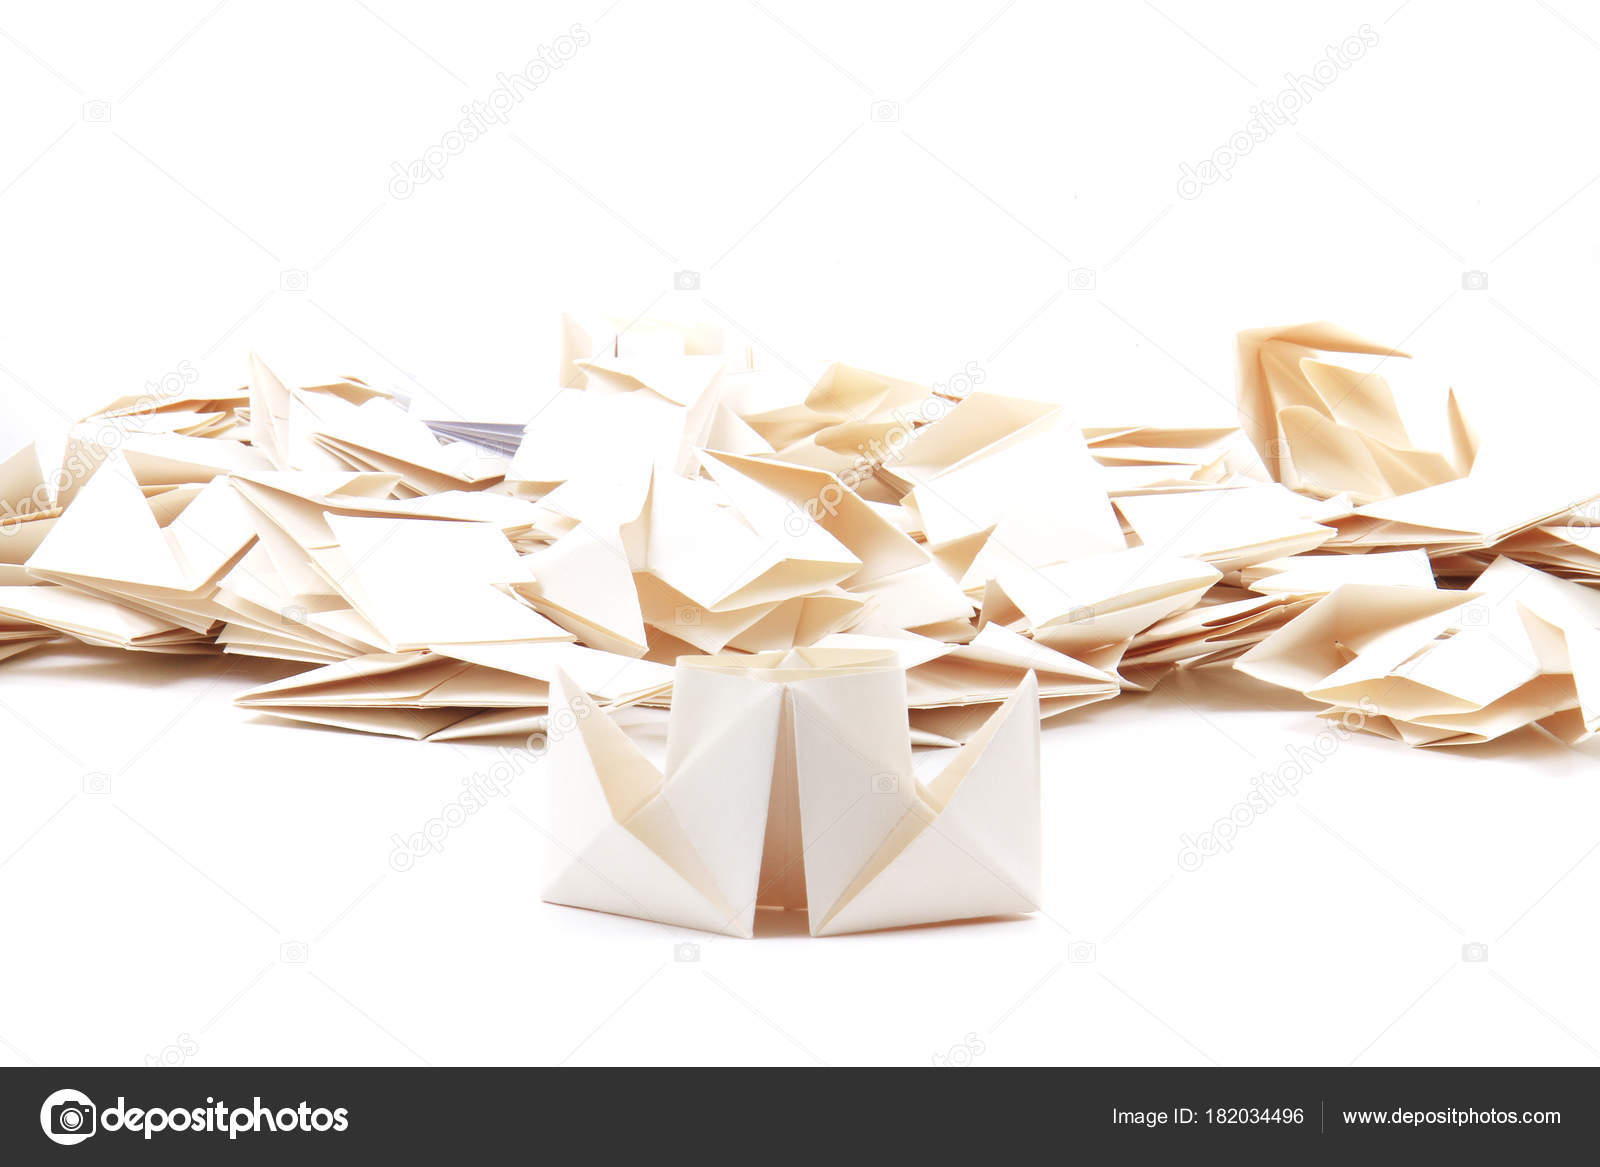 Navires Papiers Origami Comme Joli Fond Facile Photographie